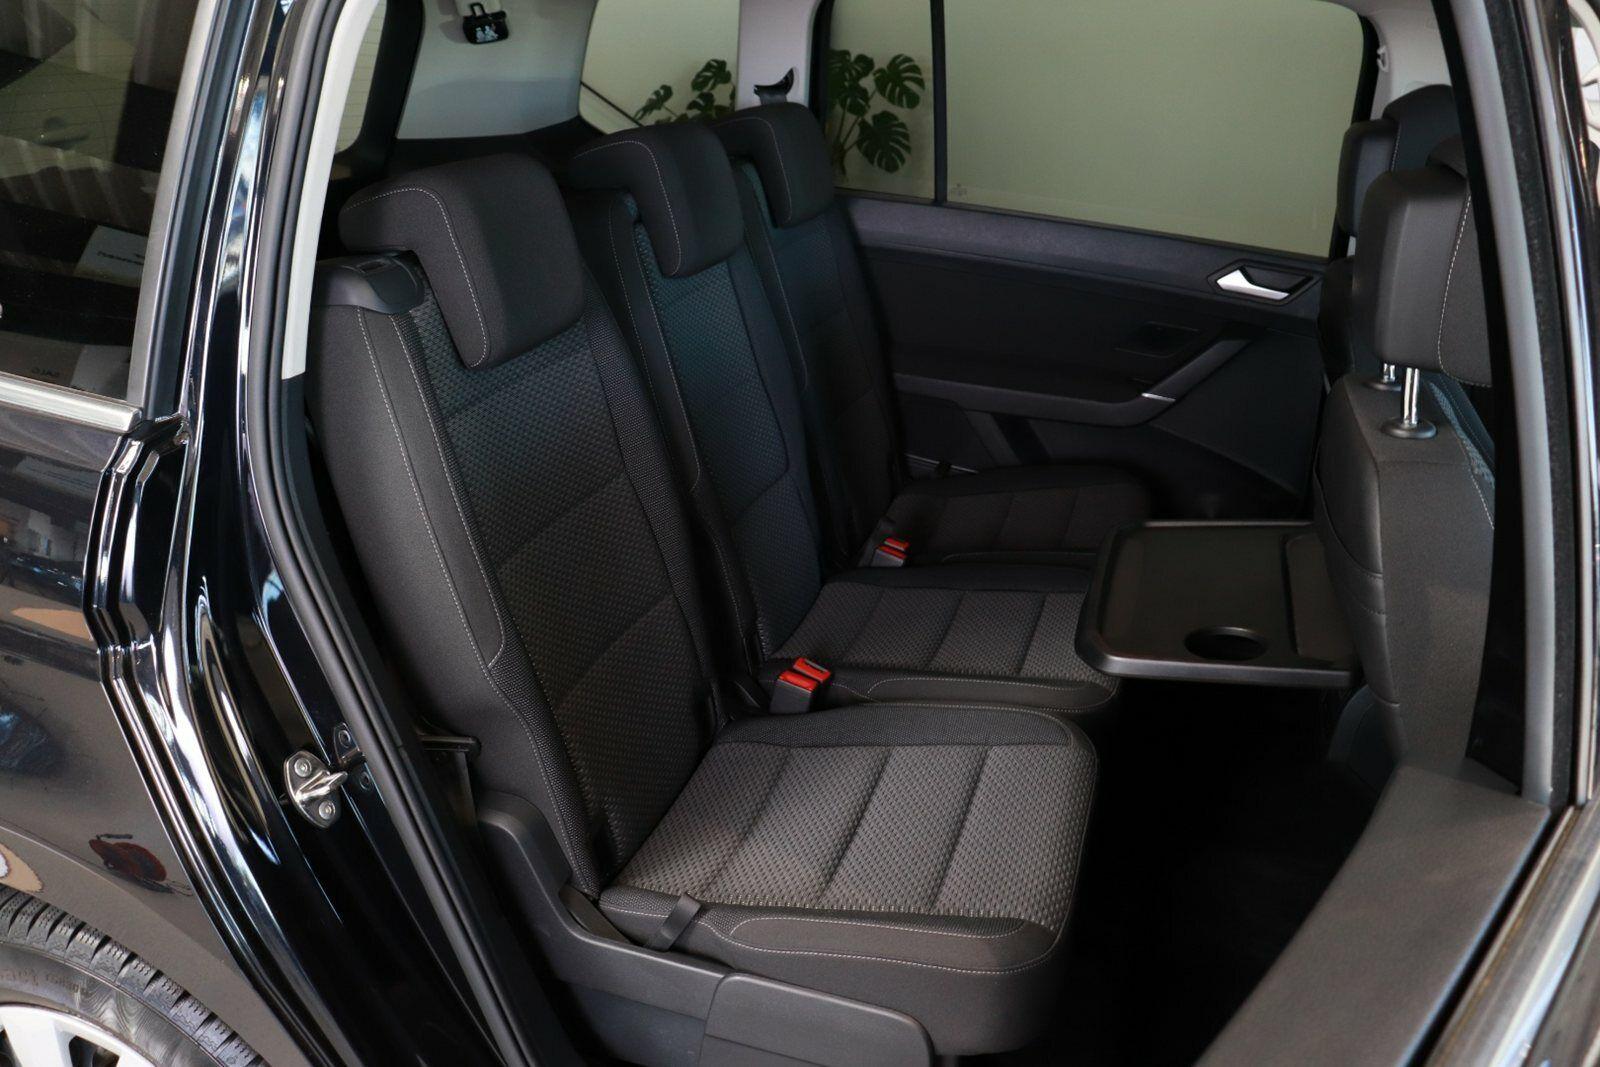 VW Touran TDi 110 Comfortline BMT 7prs